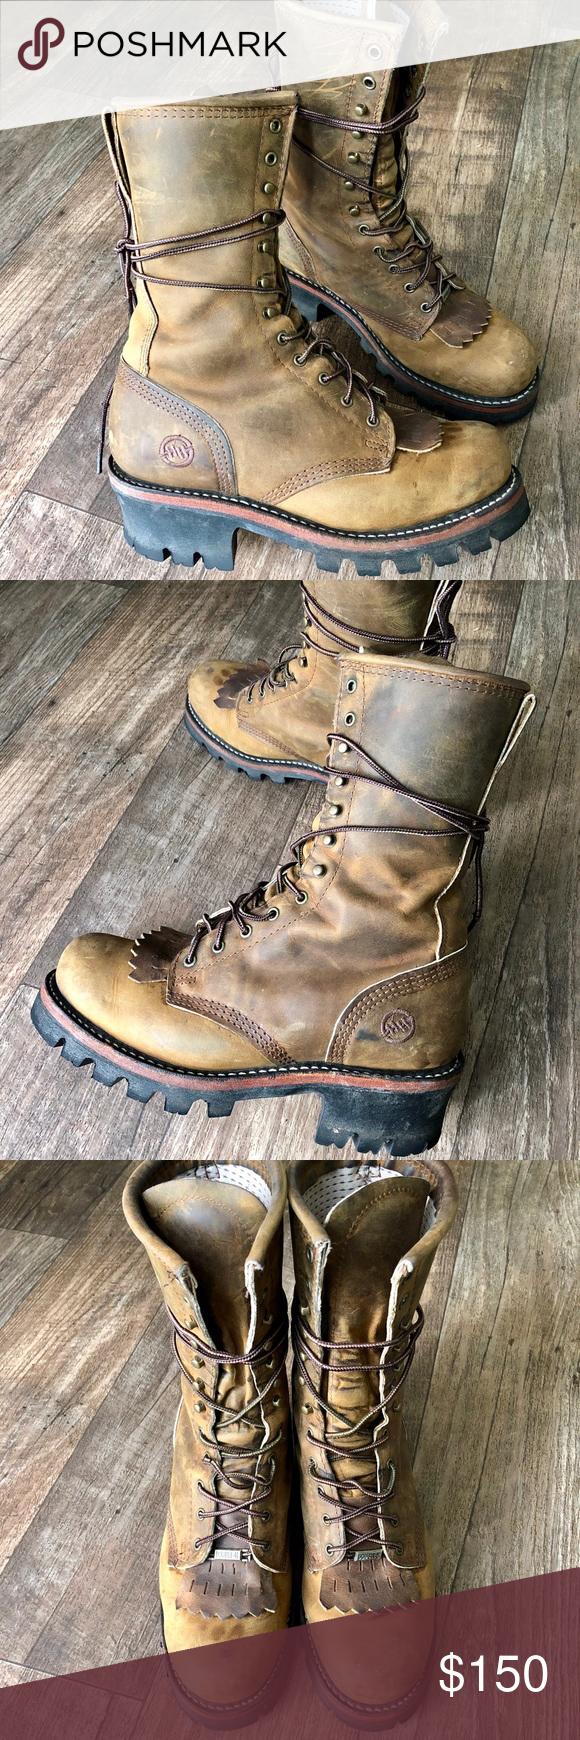 42++ Double h work boots ideas ideas